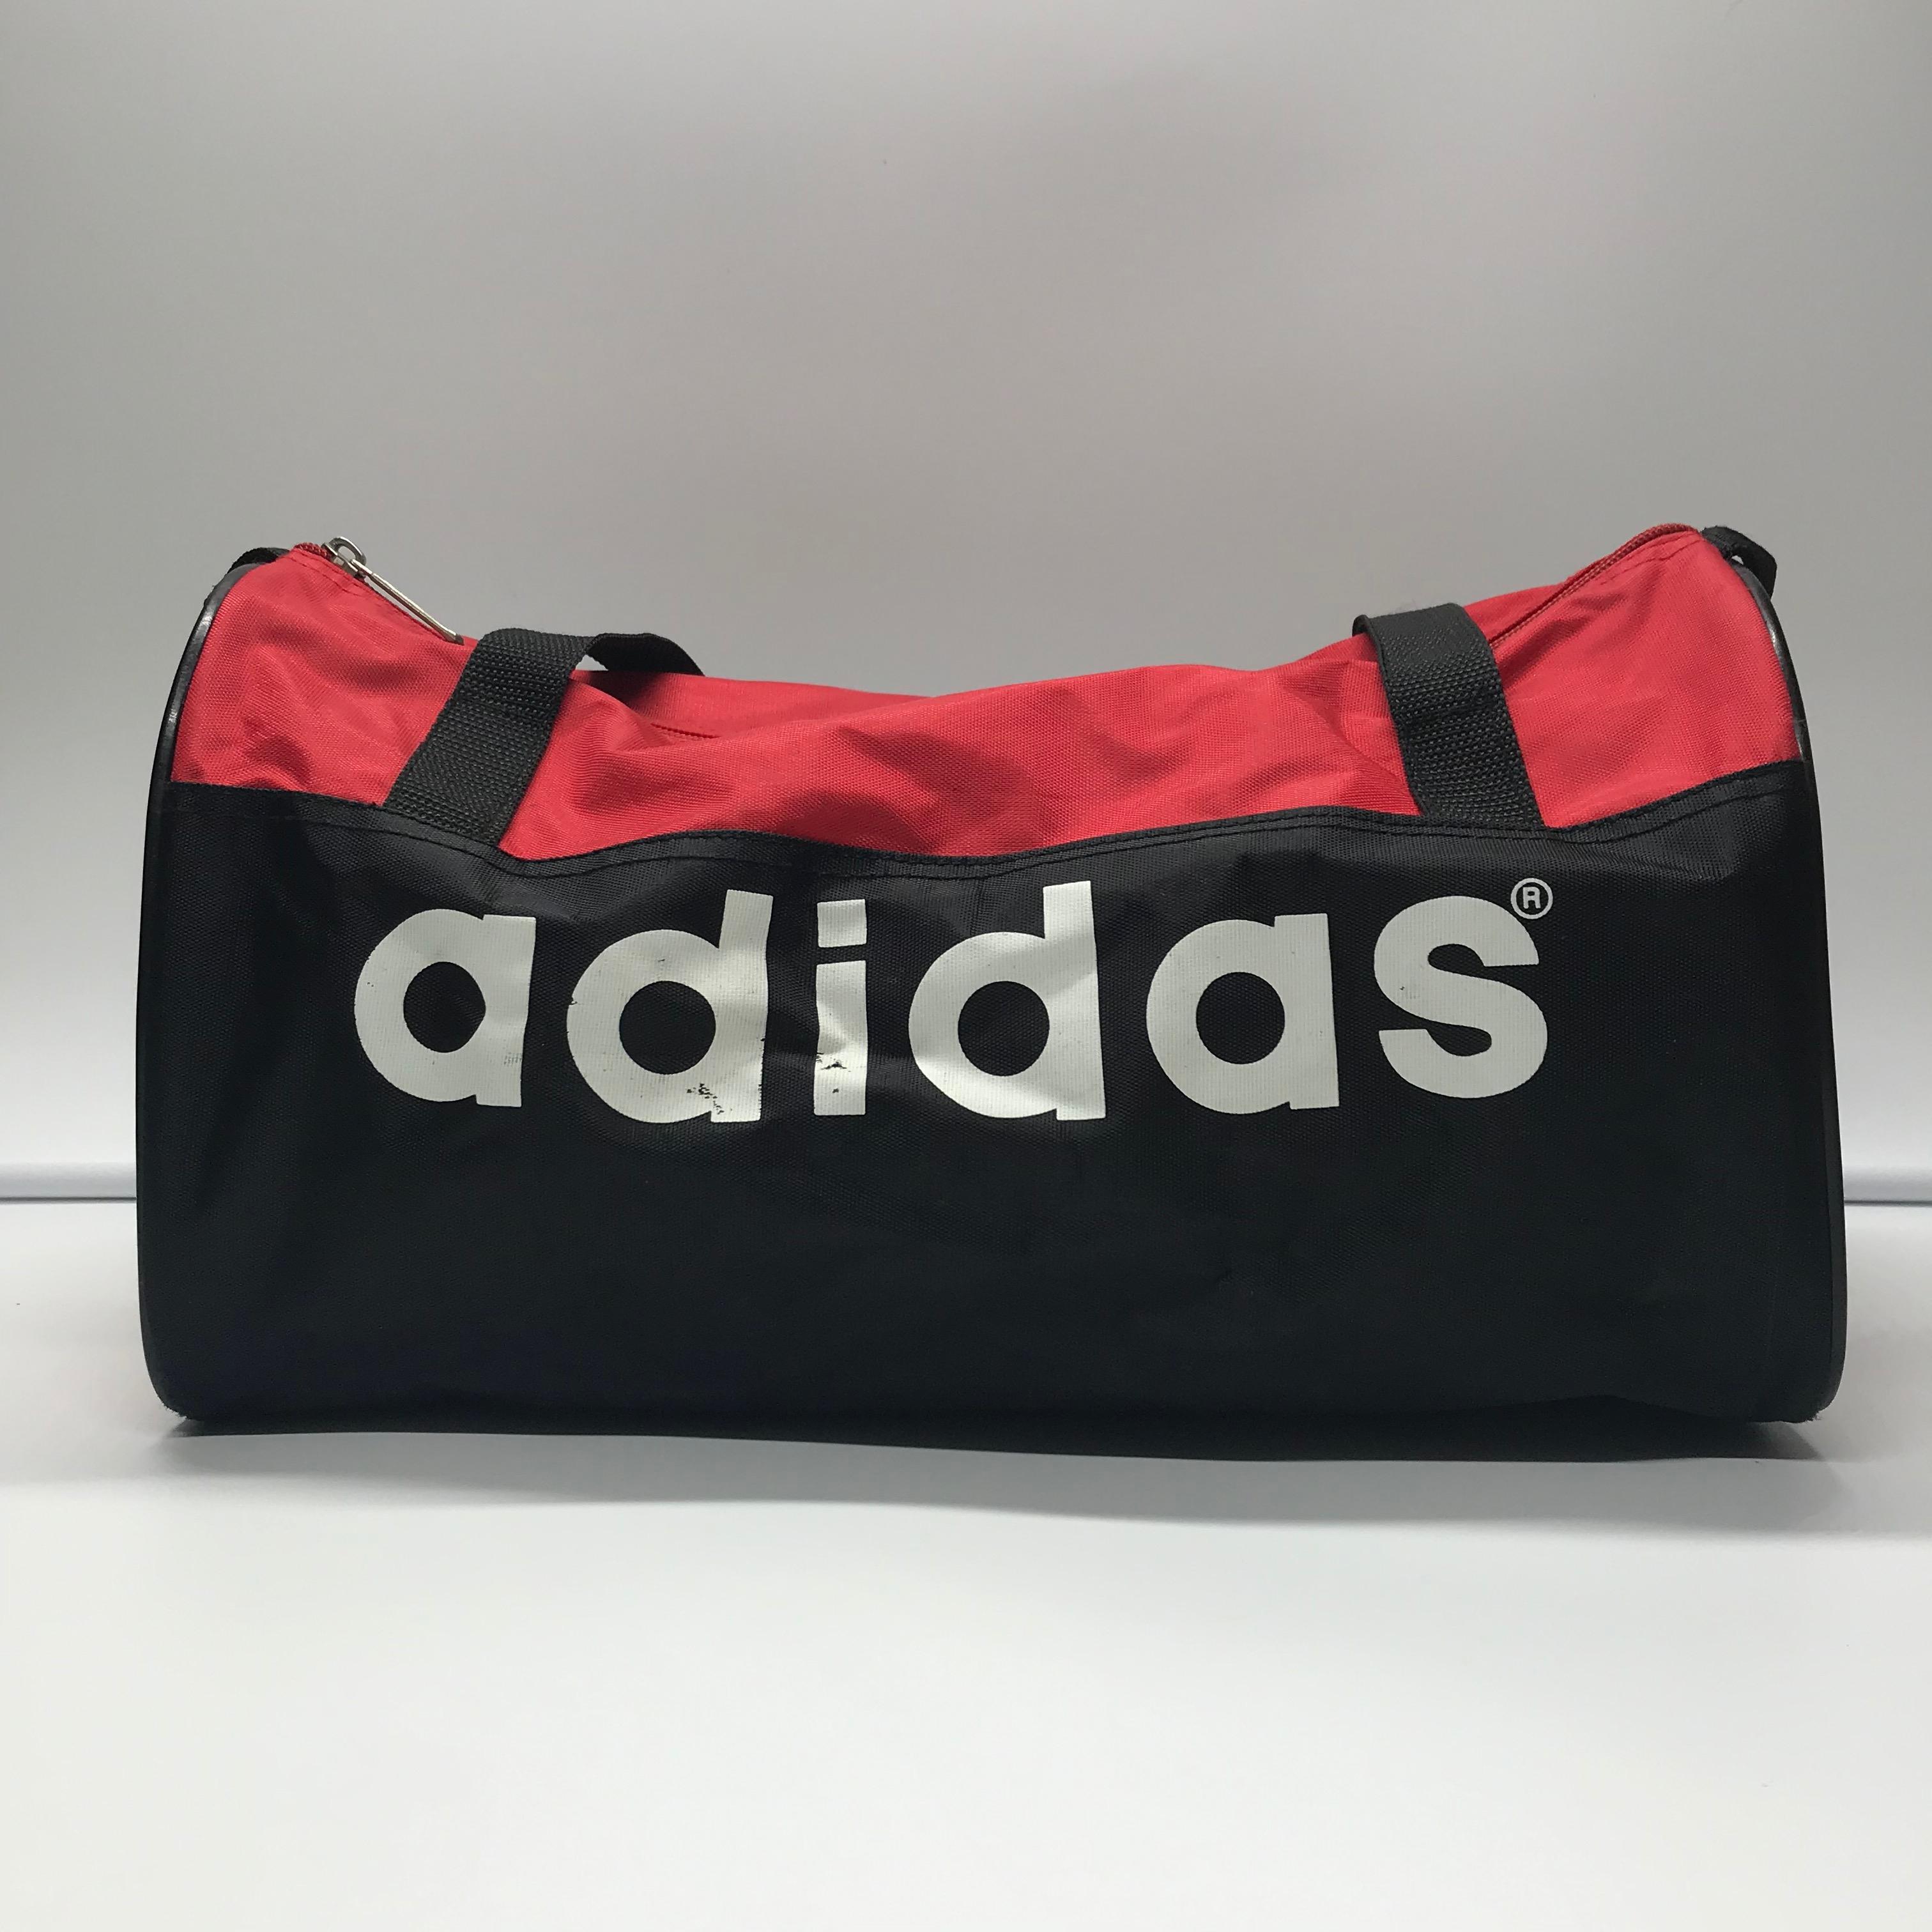 Bolsa Adidas image